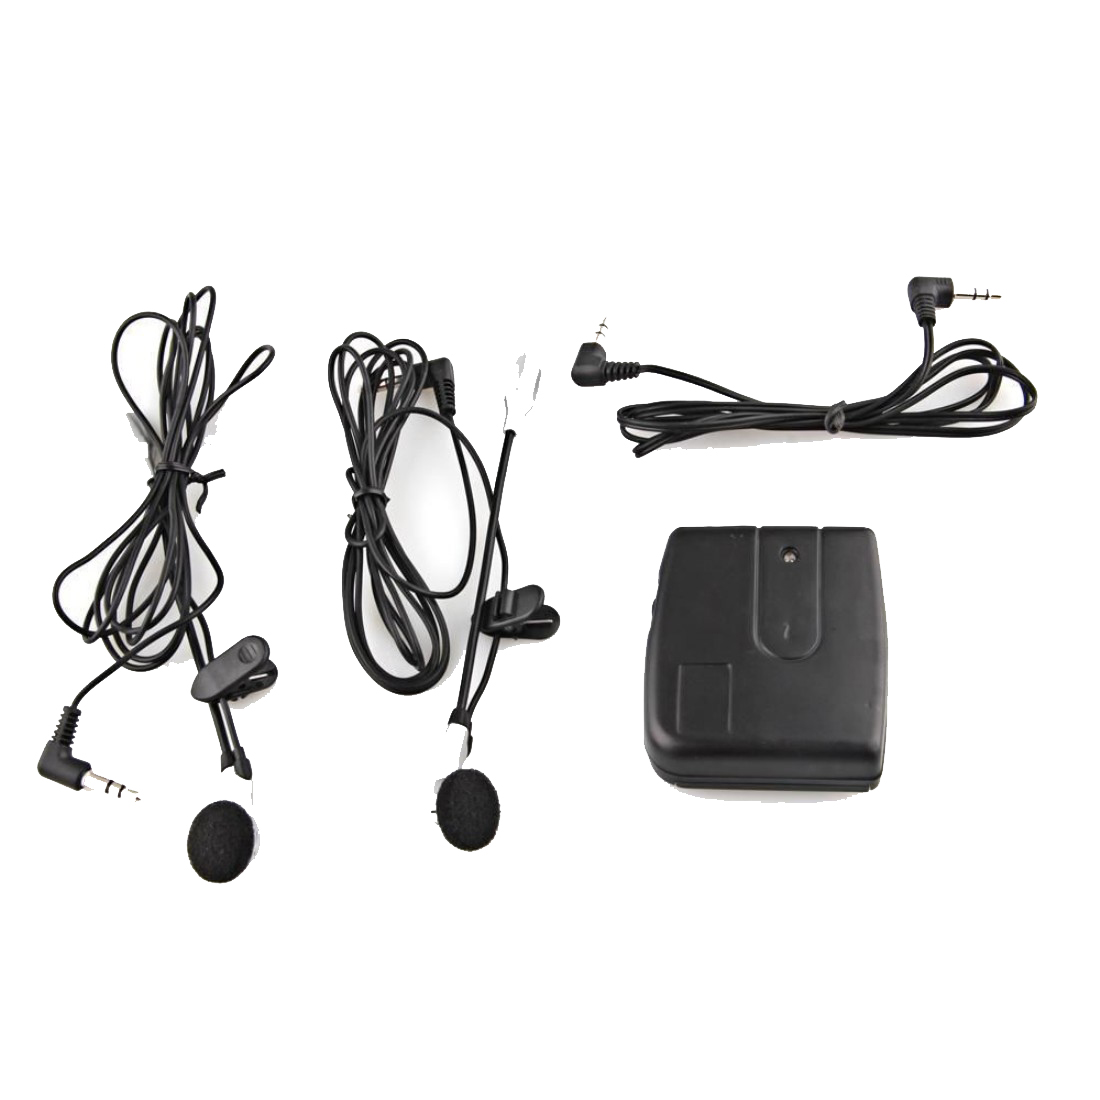 Sports Motorbike Helmet 2-Way Intercom Headset Black + Earphone Stereo